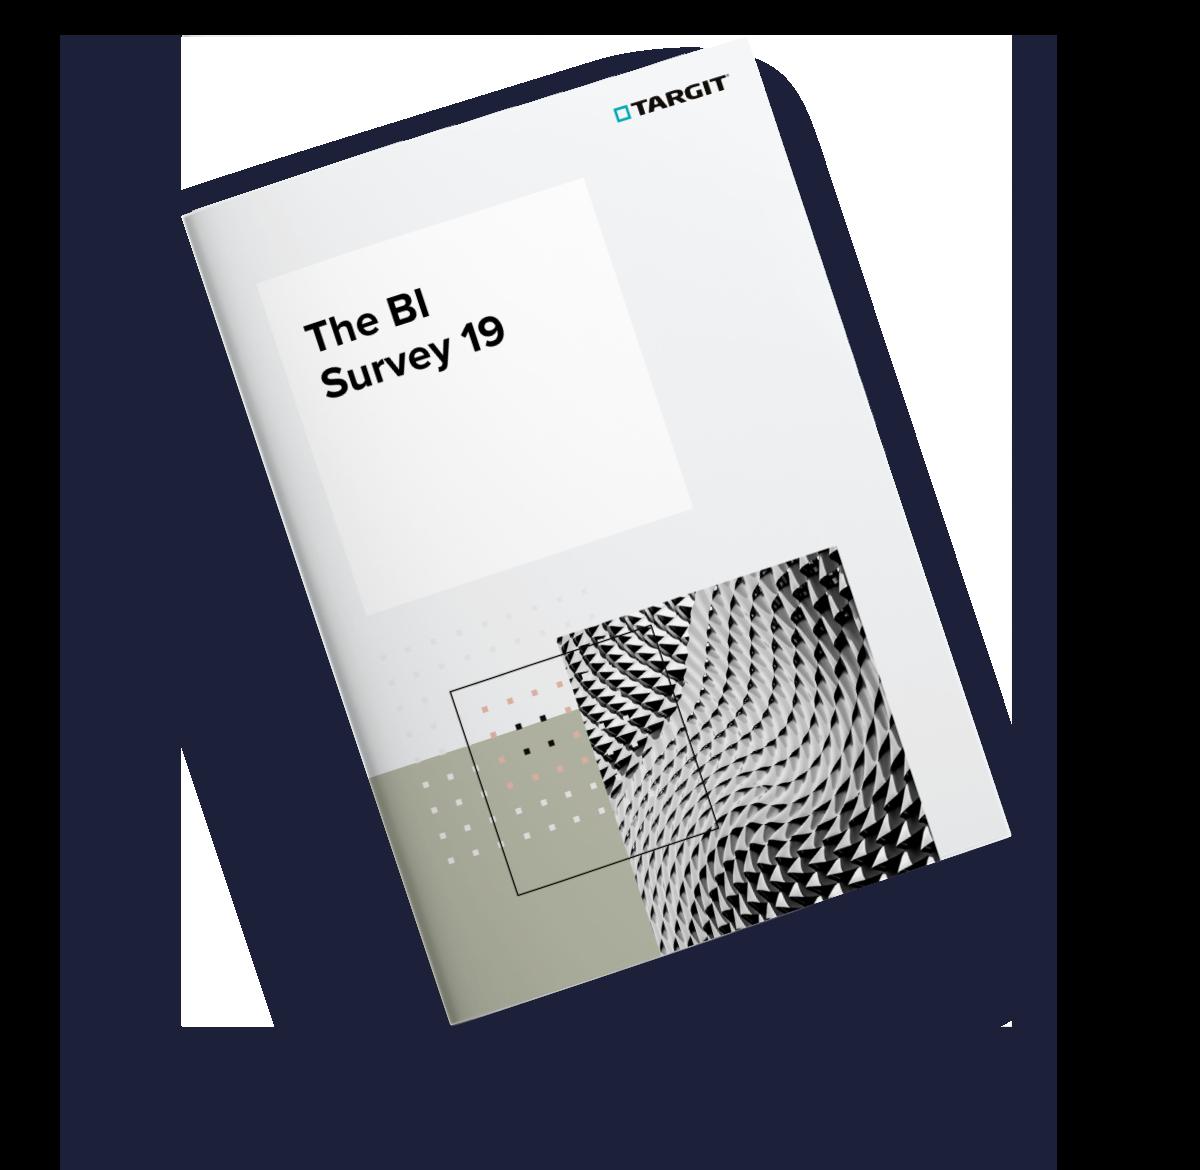 The BI Survey 19 cover